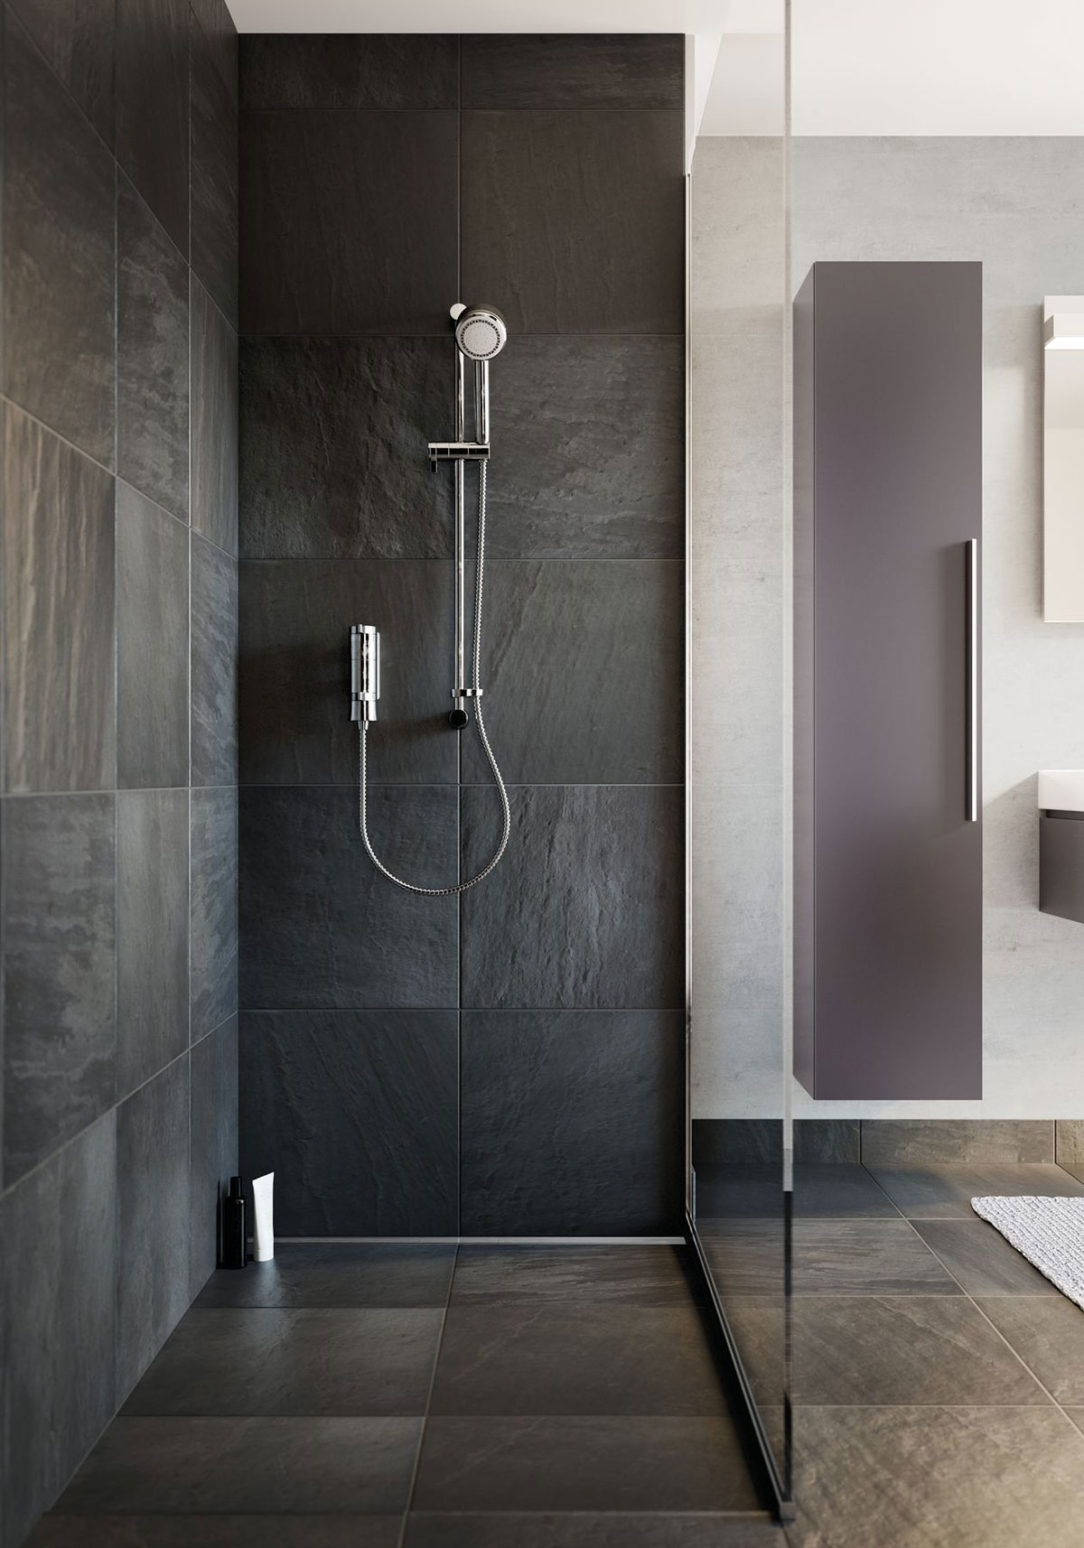 2018 Bathroom 07 C iCon Series.tif bigview